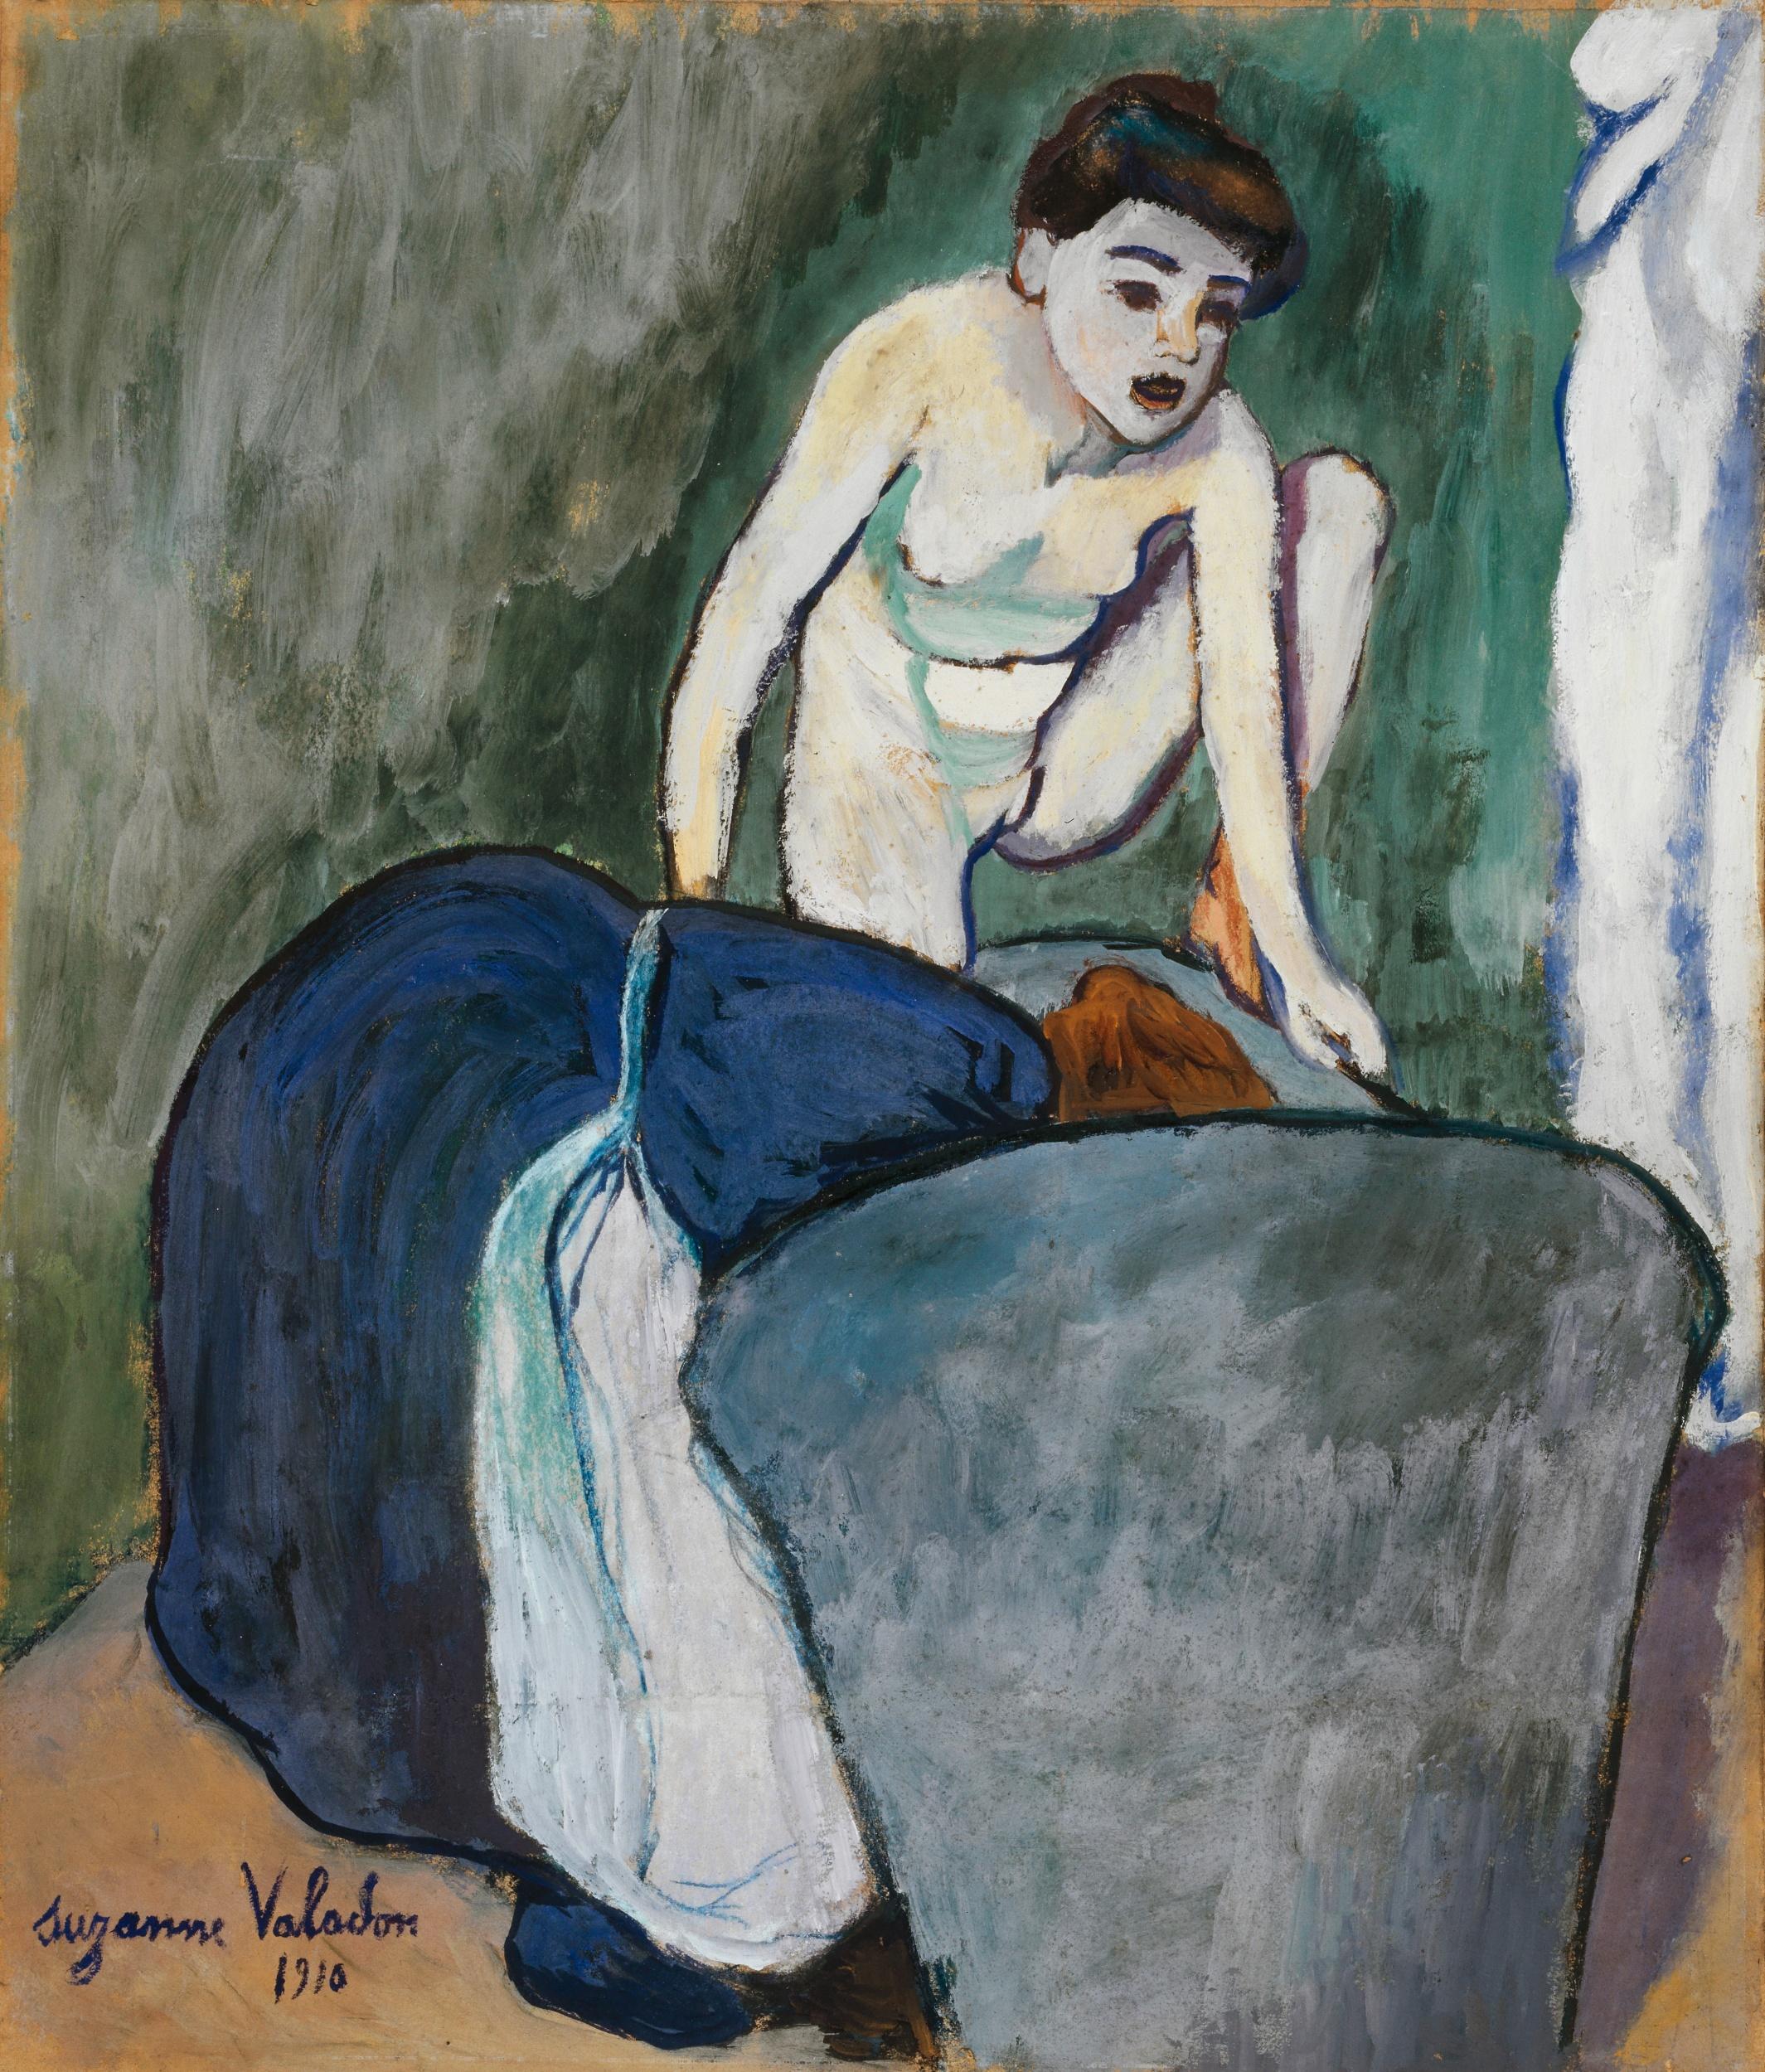 Suzanne Valadon, La Grenouille, 1910. Stiftung Im Obersteg, Depositum im Kunstmuseum Basel